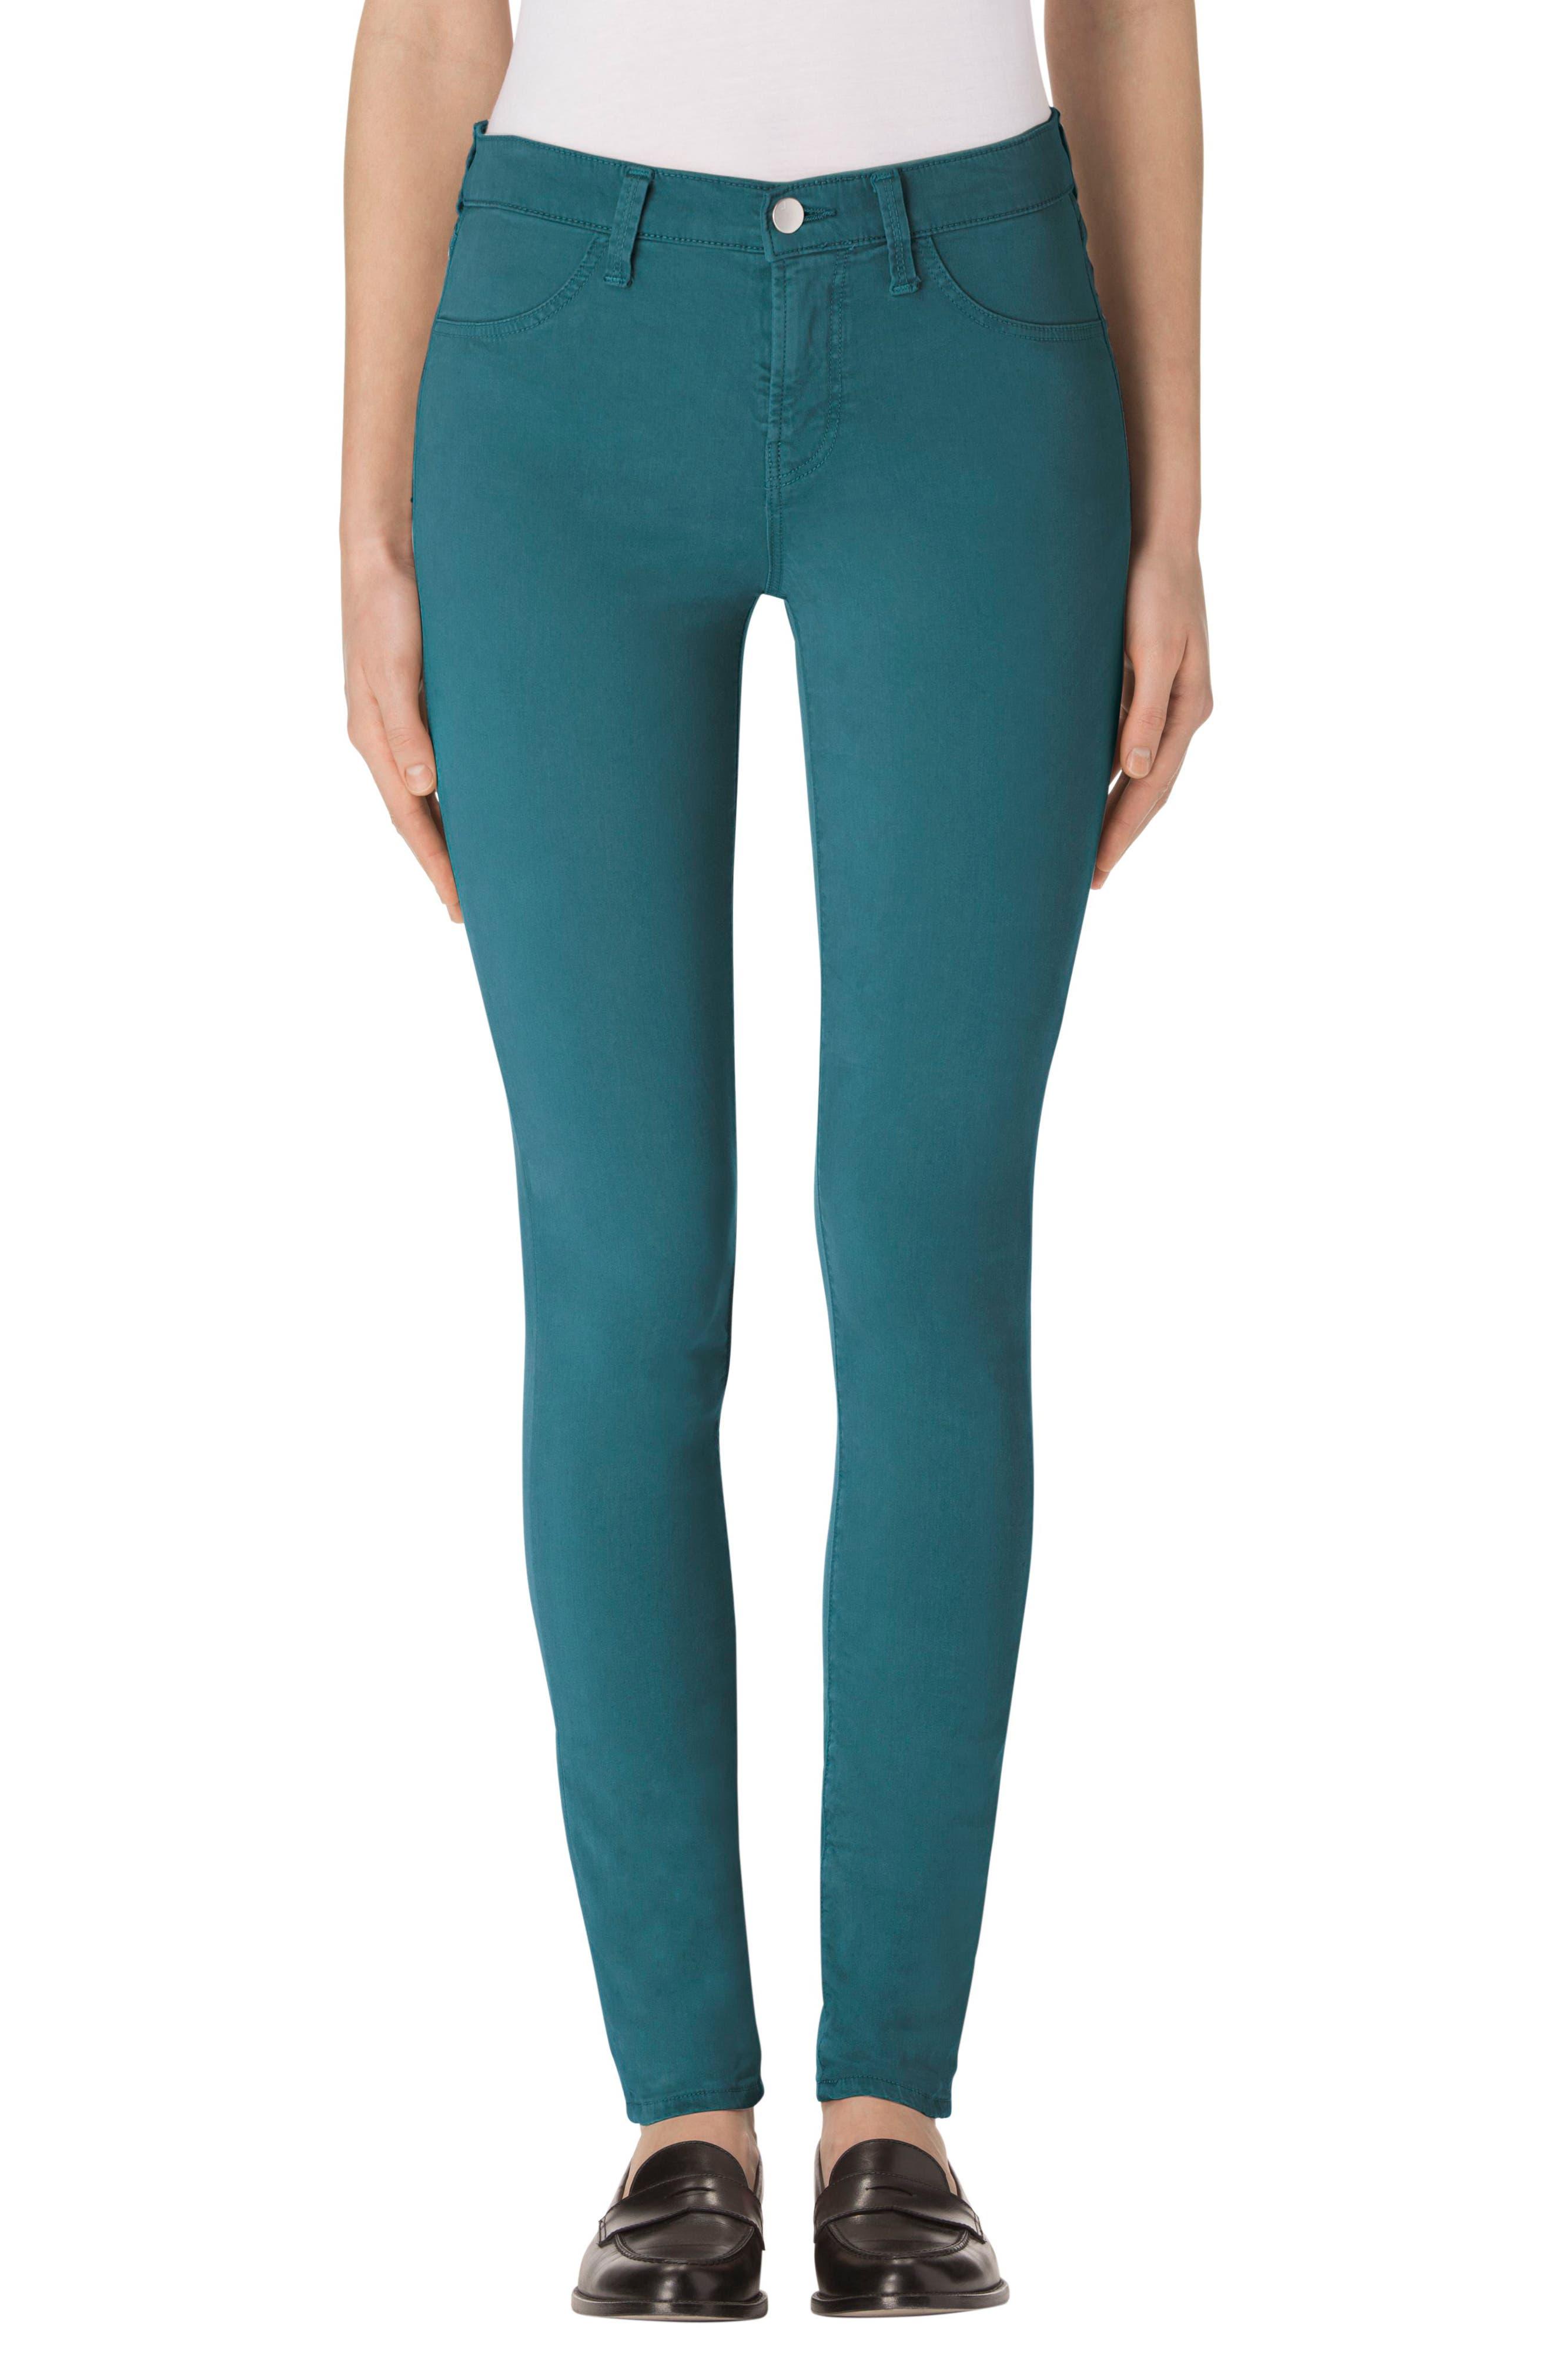 J Brand High Waist Ankle Super Skinny Jeans